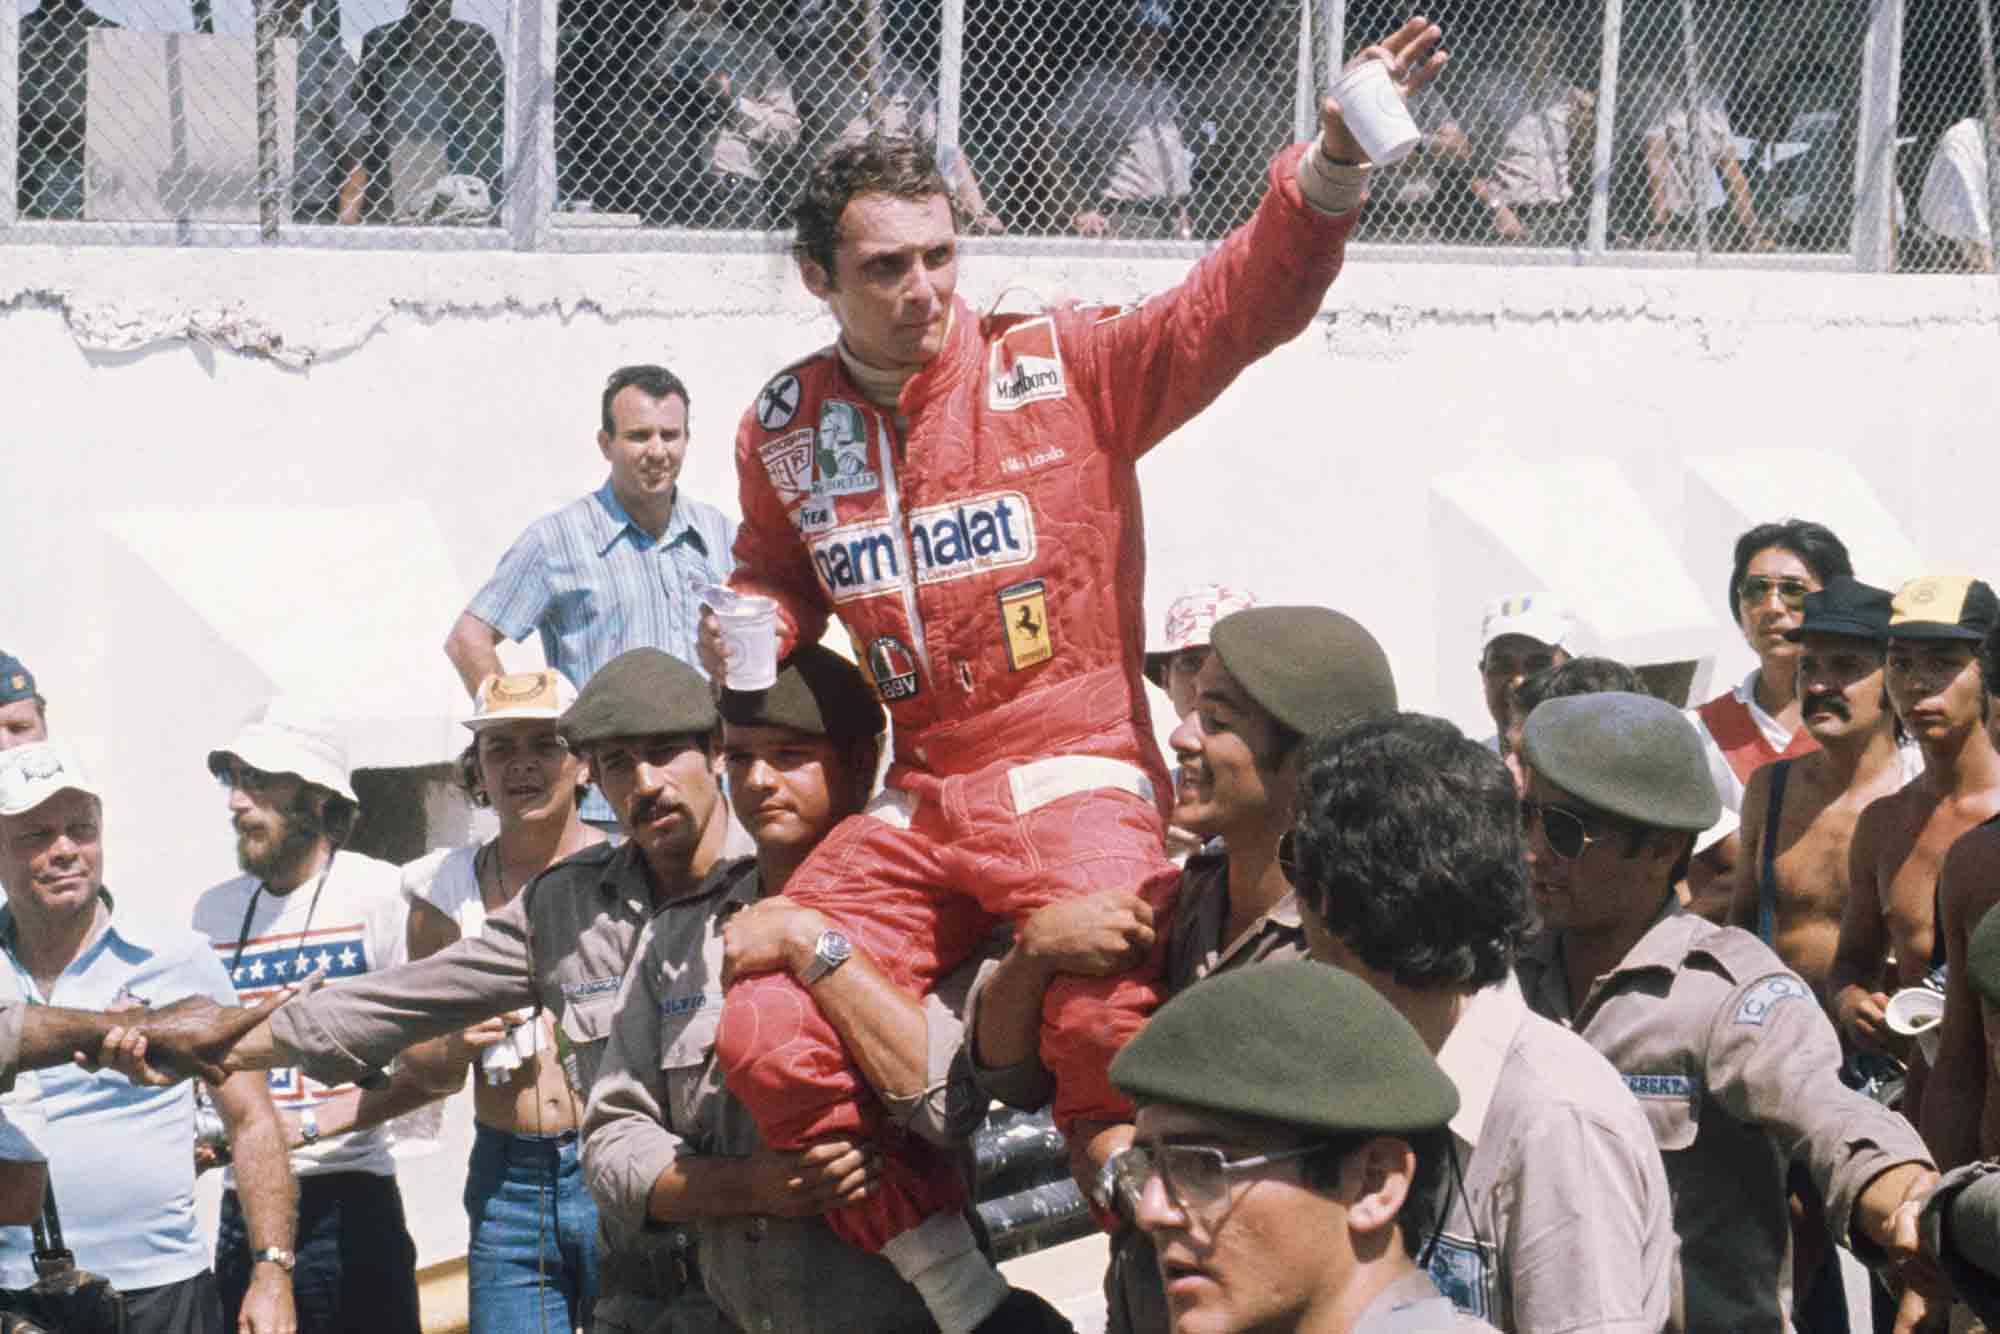 Niki Lauda is held aloft by Brazilian soldiers after winning the 1976 Brazilian Grand Prix for Ferrari